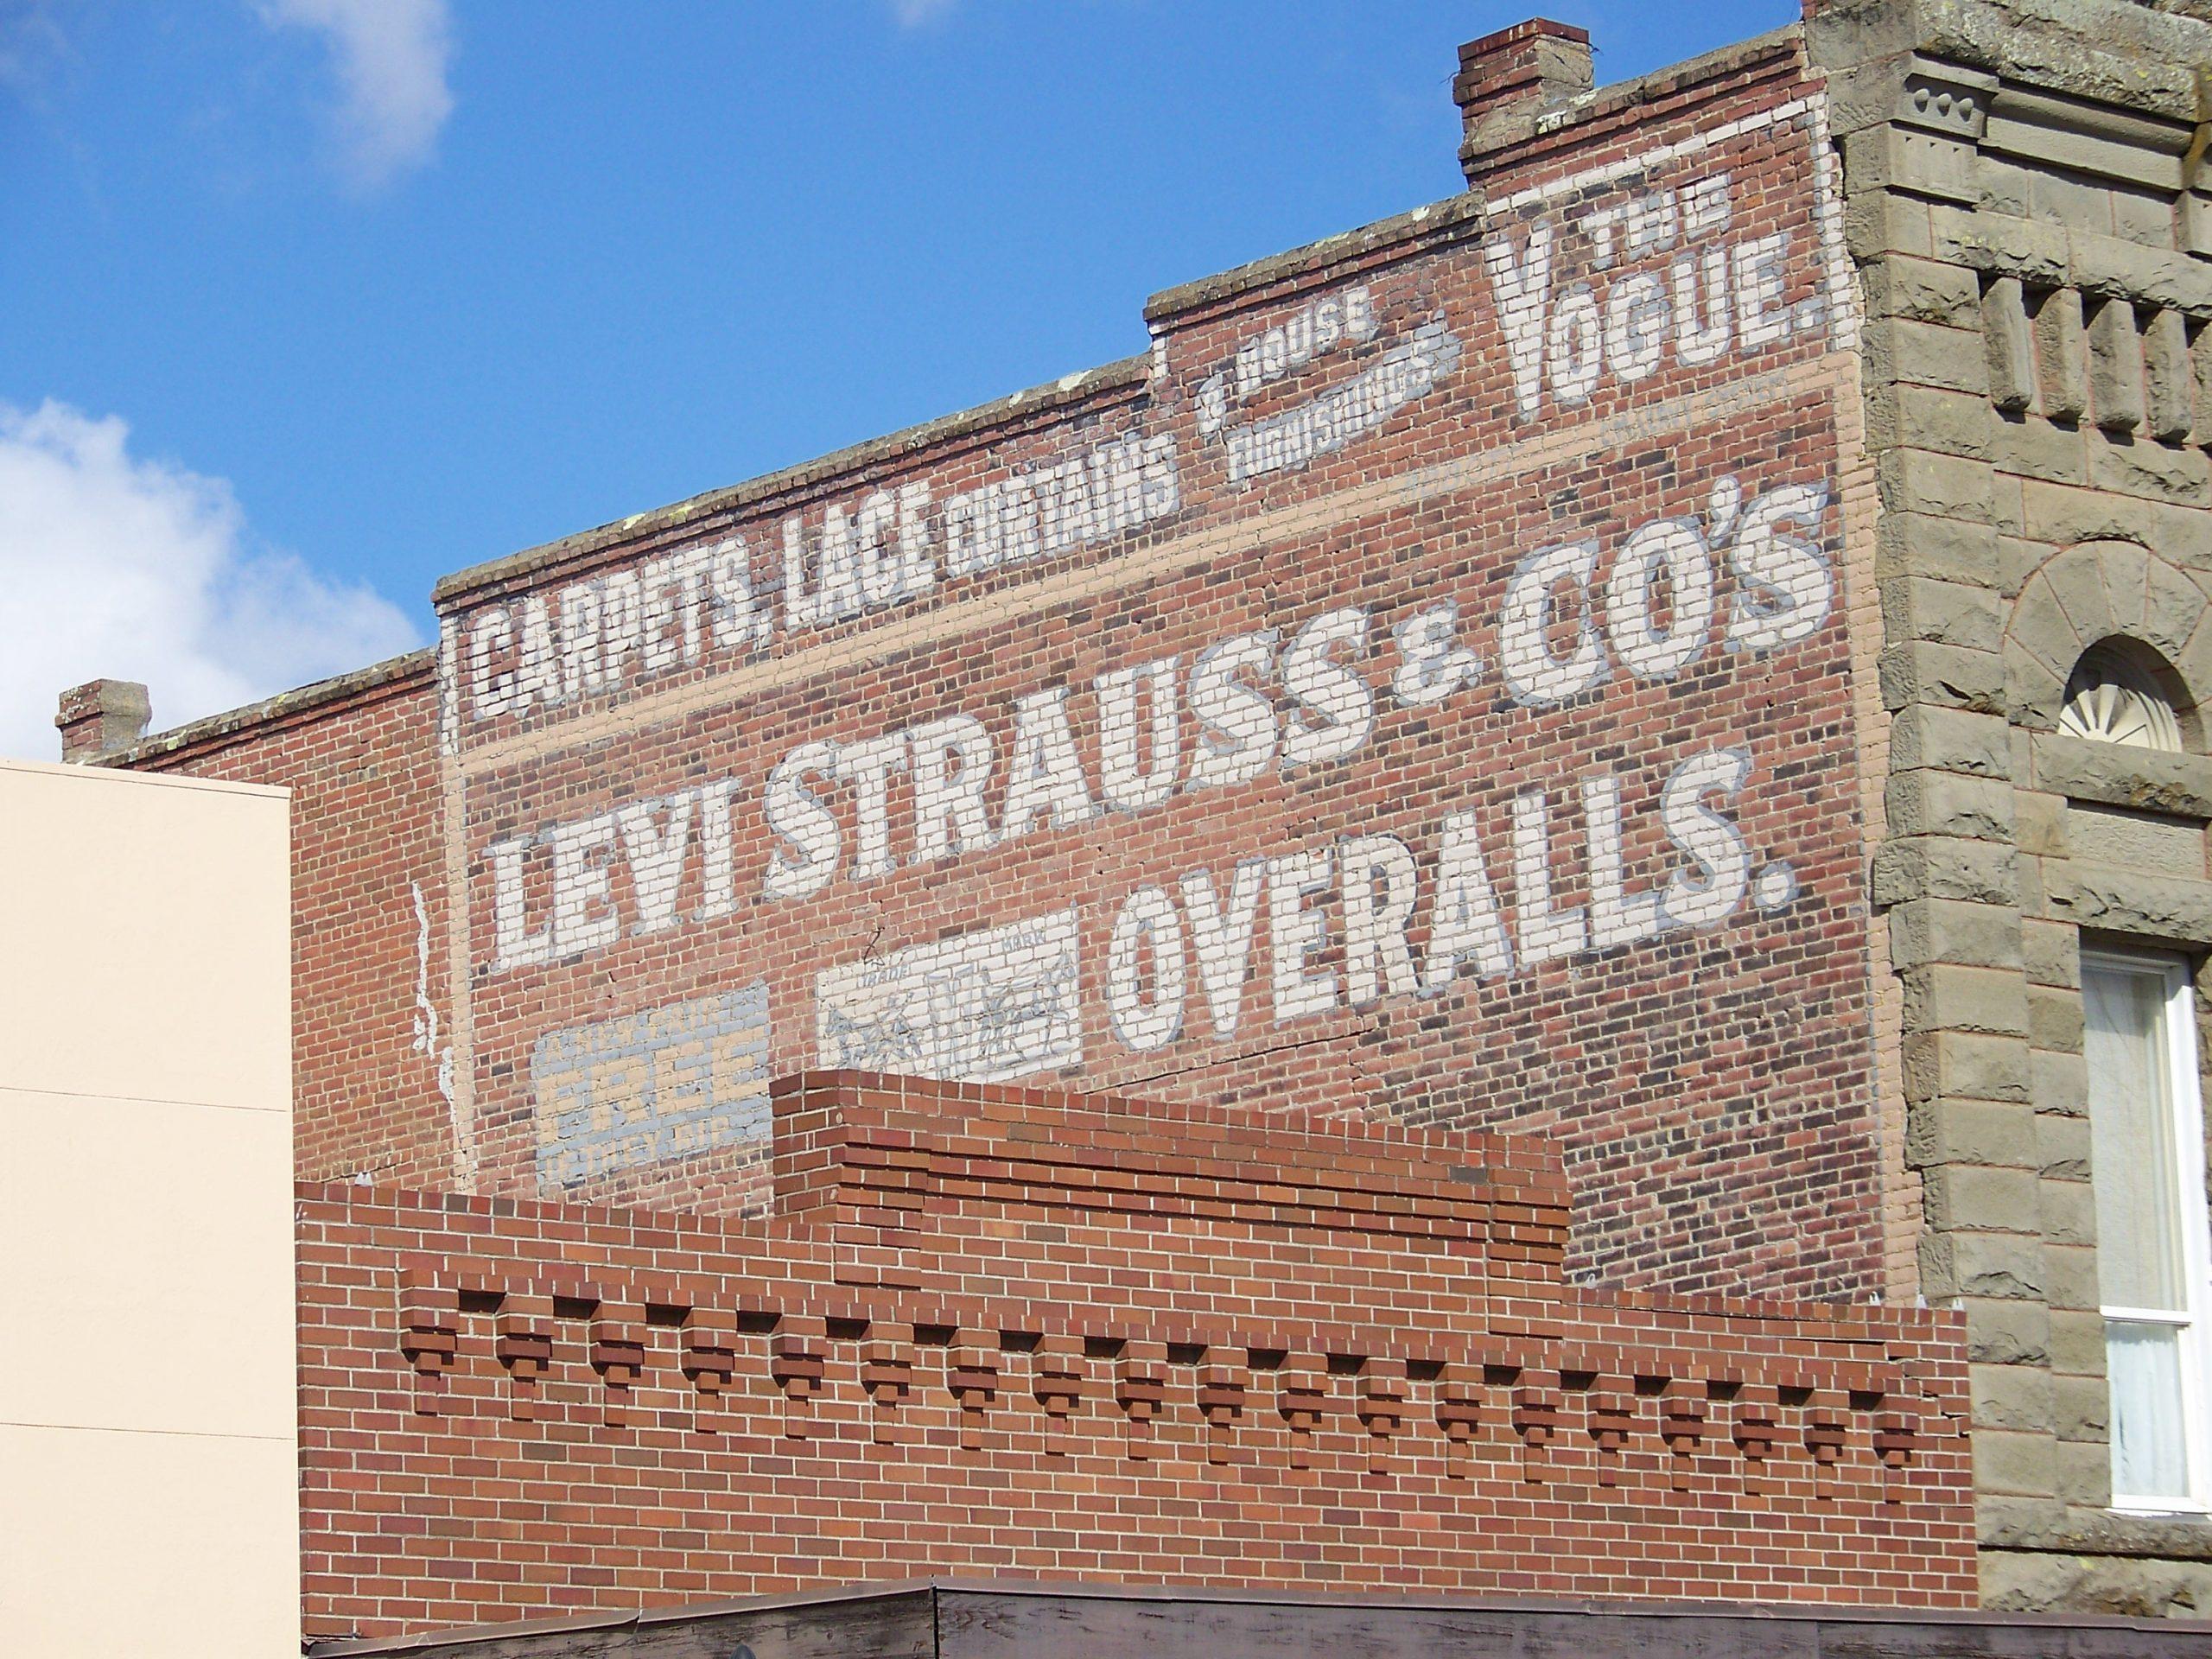 Hemp, Levi's and The Clash?